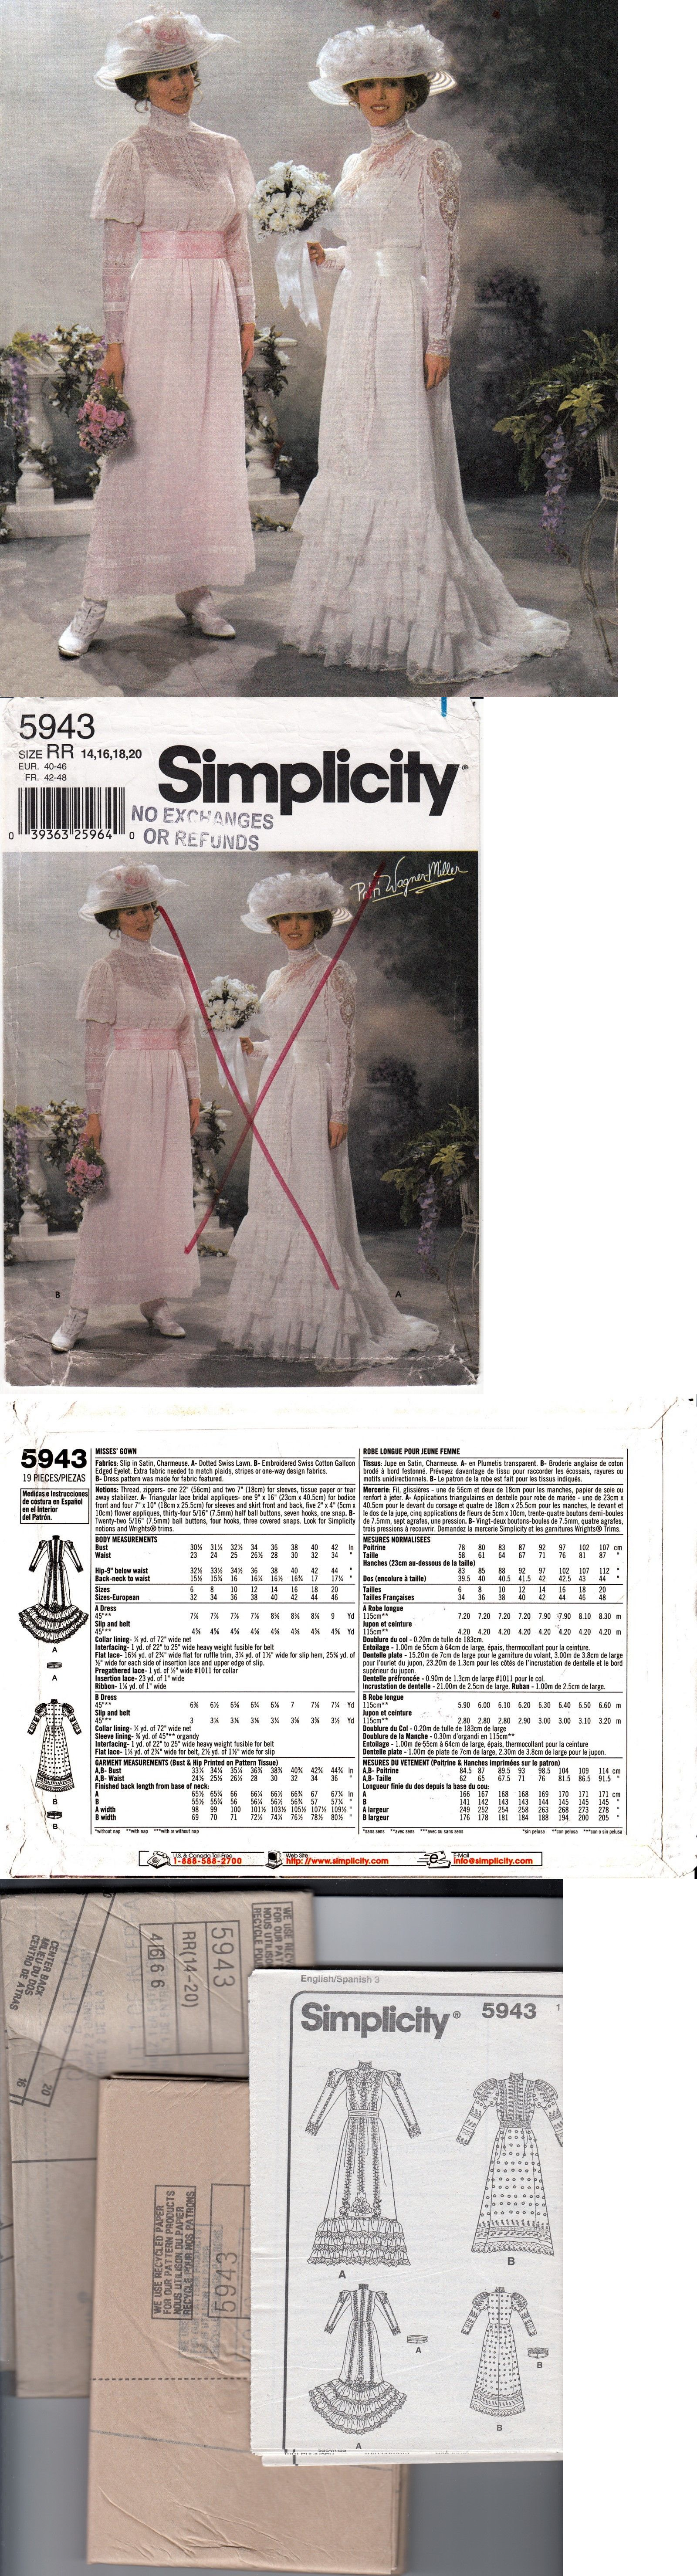 Sewing Patterns 28174: Misses Victorian Edwardian Wedding Bridal ...